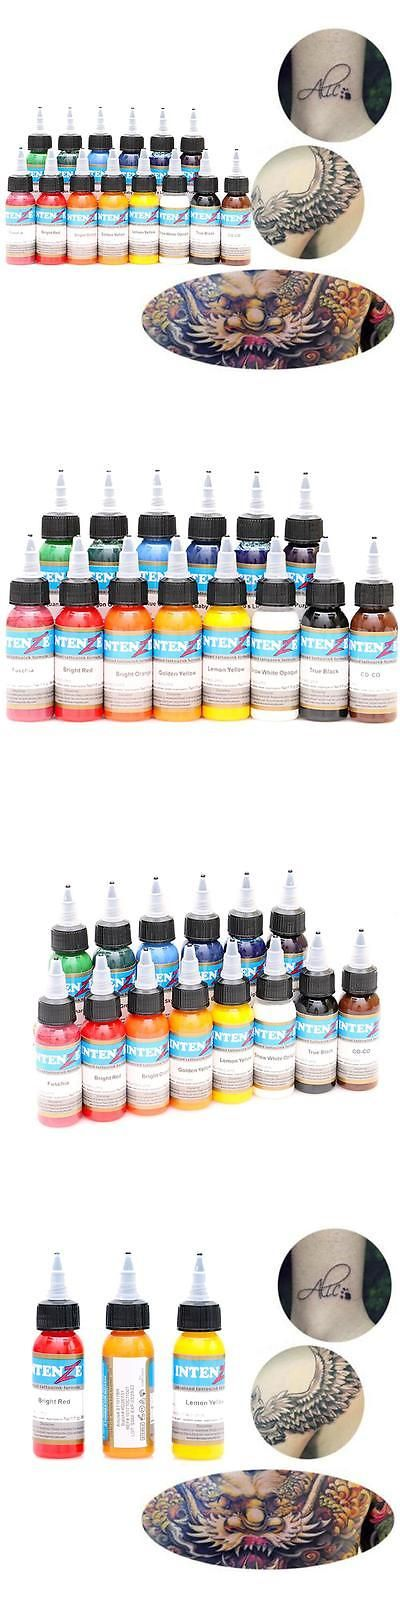 Tattoo Inks: Salon Tattoo Ink 14 Colors Set 1Oz 30Ml Bottle Tattoo Pigment Kit -> BUY IT NOW ONLY: $33.88 on eBay!